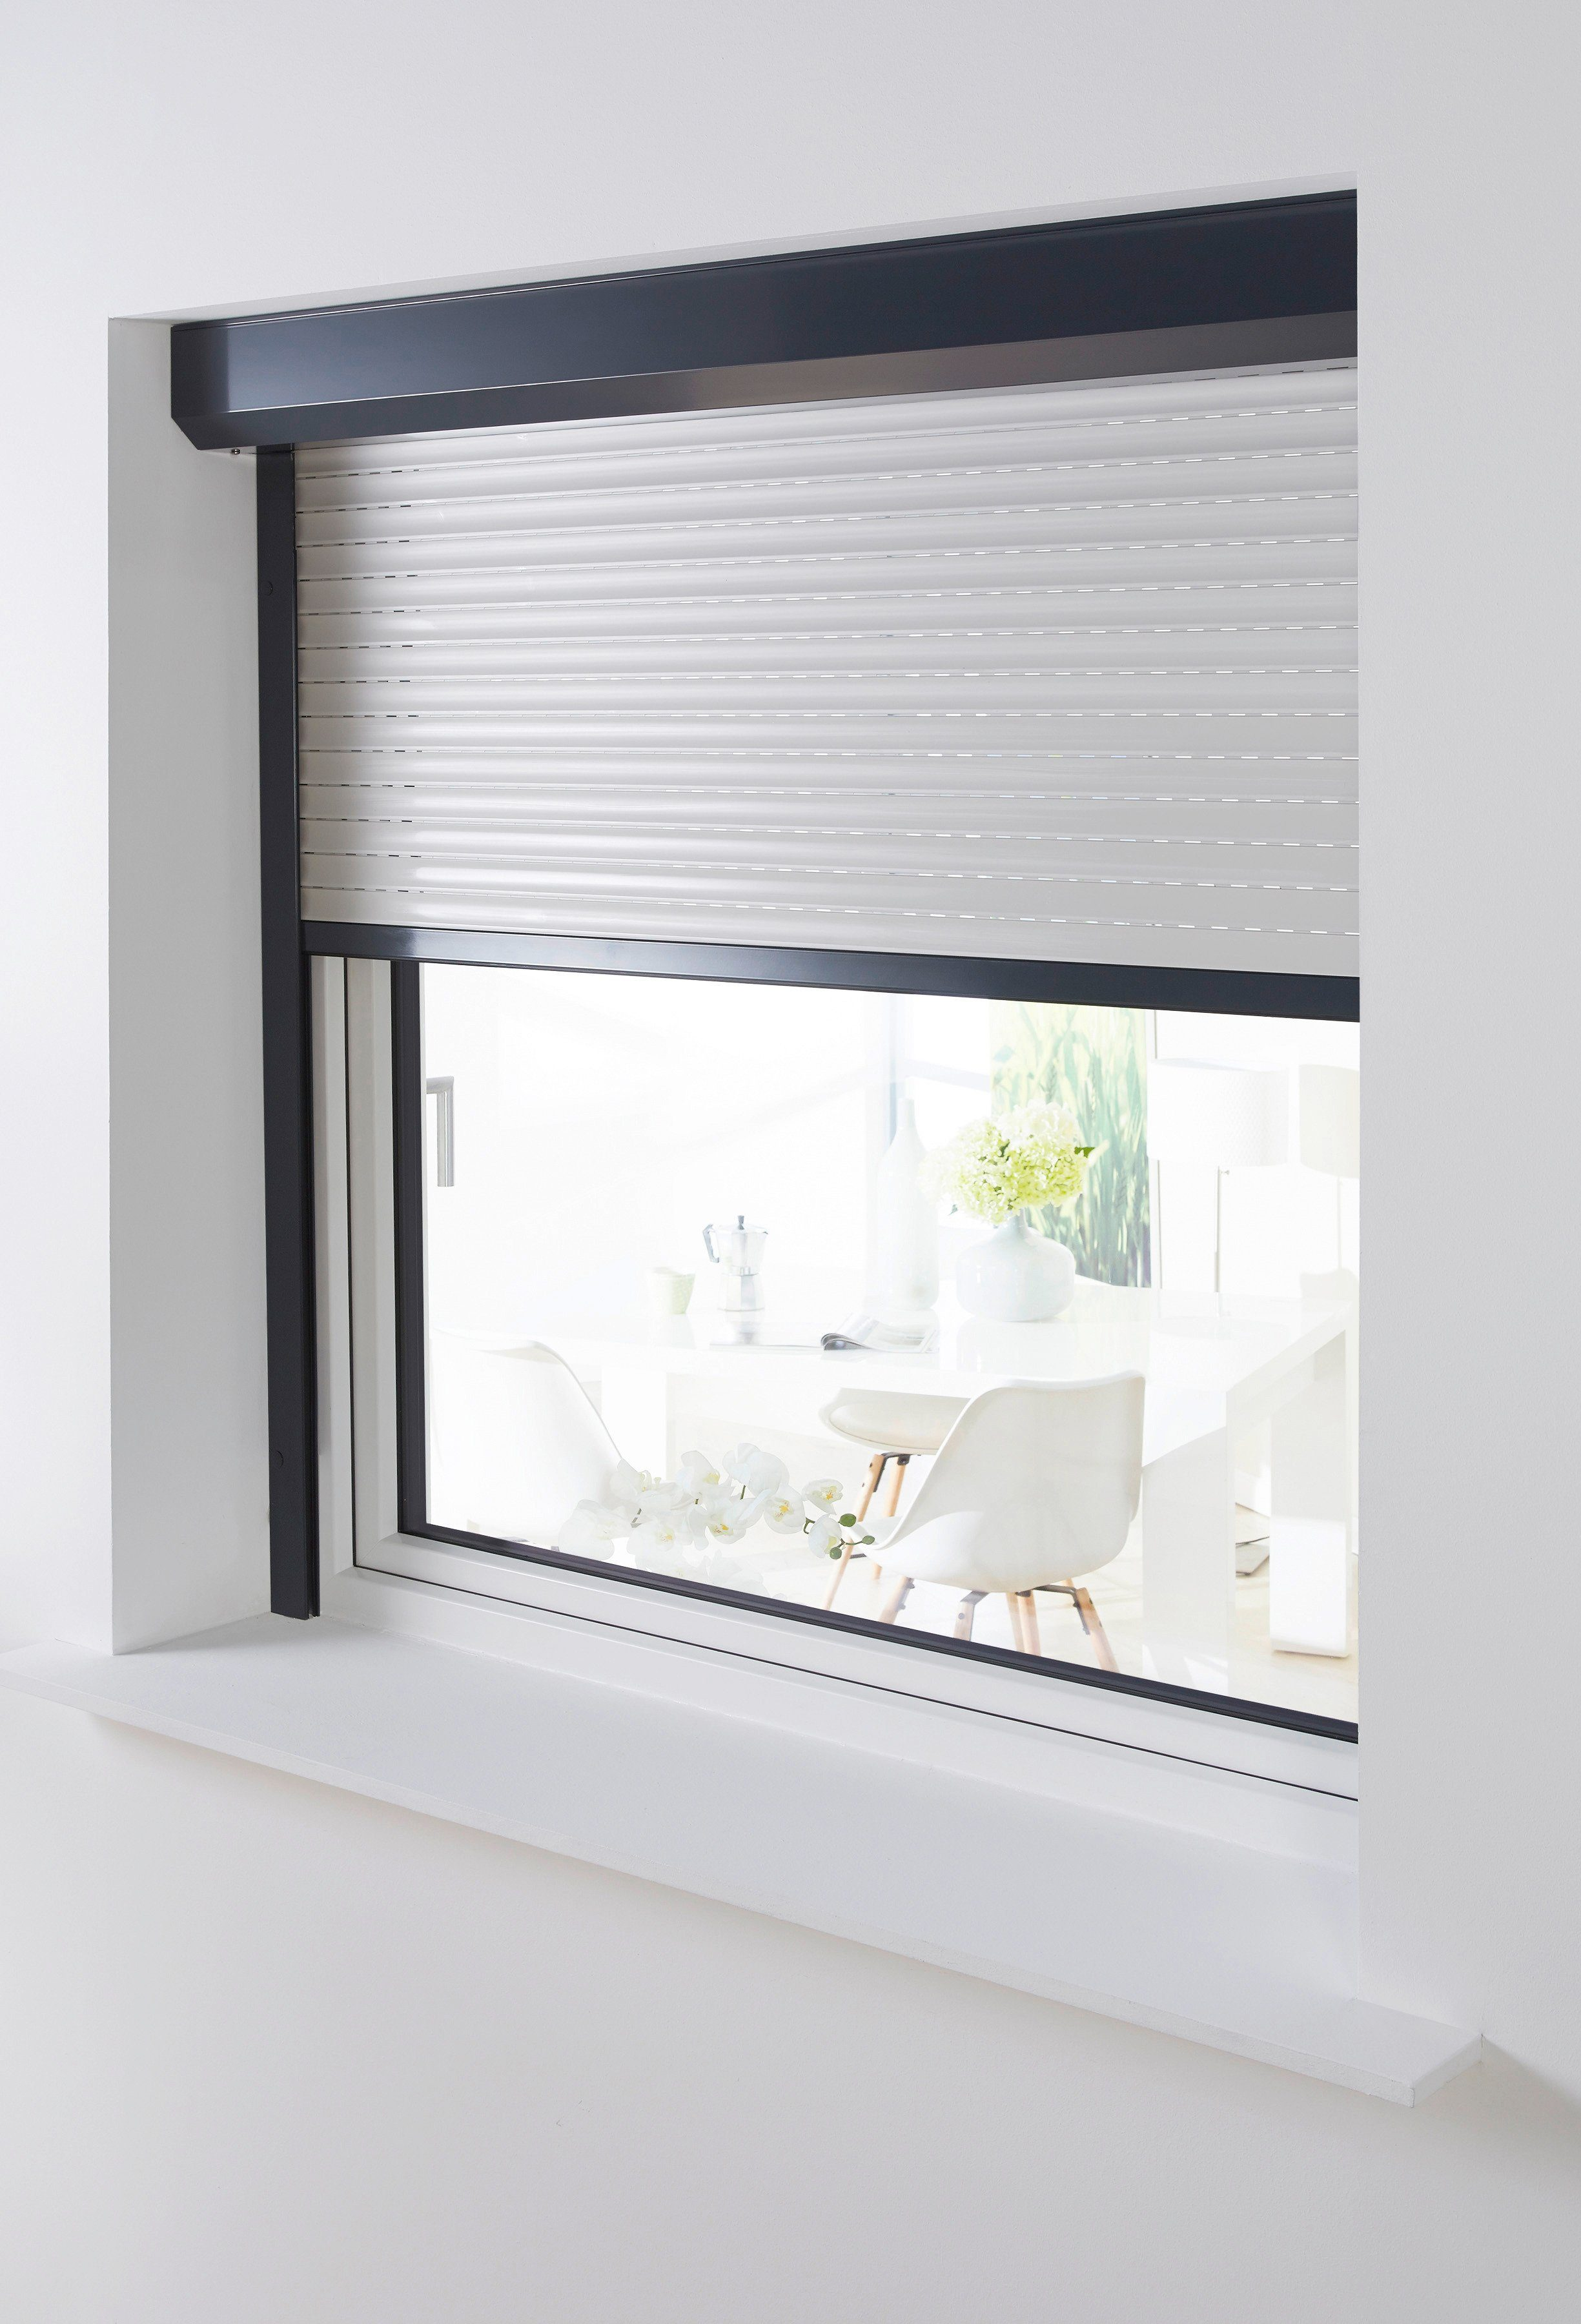 Aluminium »Vorbau-Rollladen« Sondermaß Breite, Höhe: 160 cm anthrazit-grau